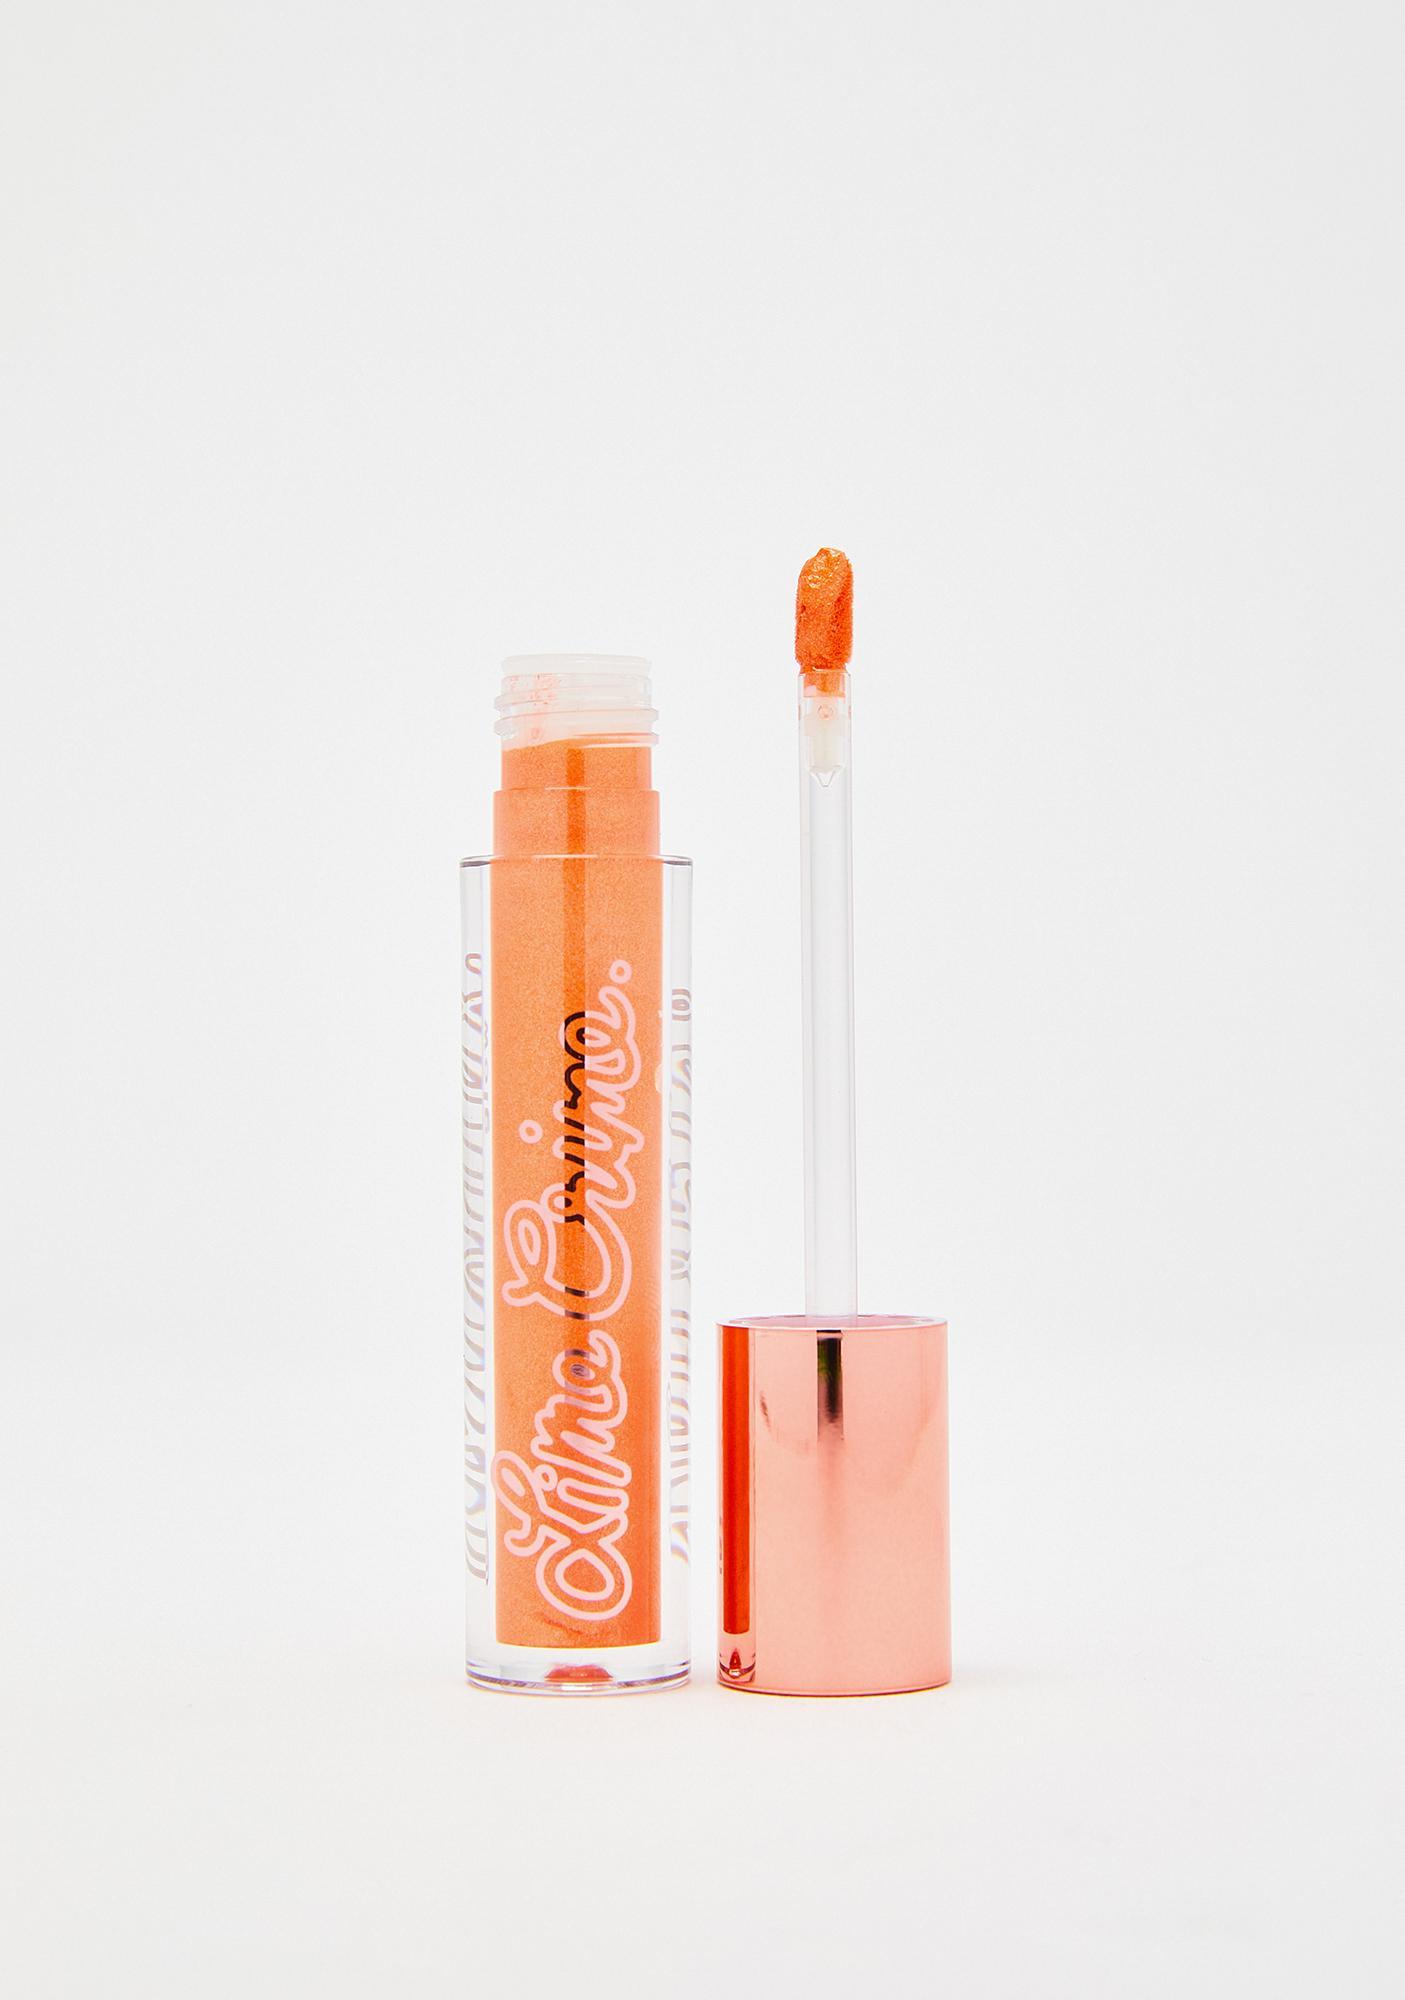 Lime Crime Popsicle Plushies Glow Lipstick